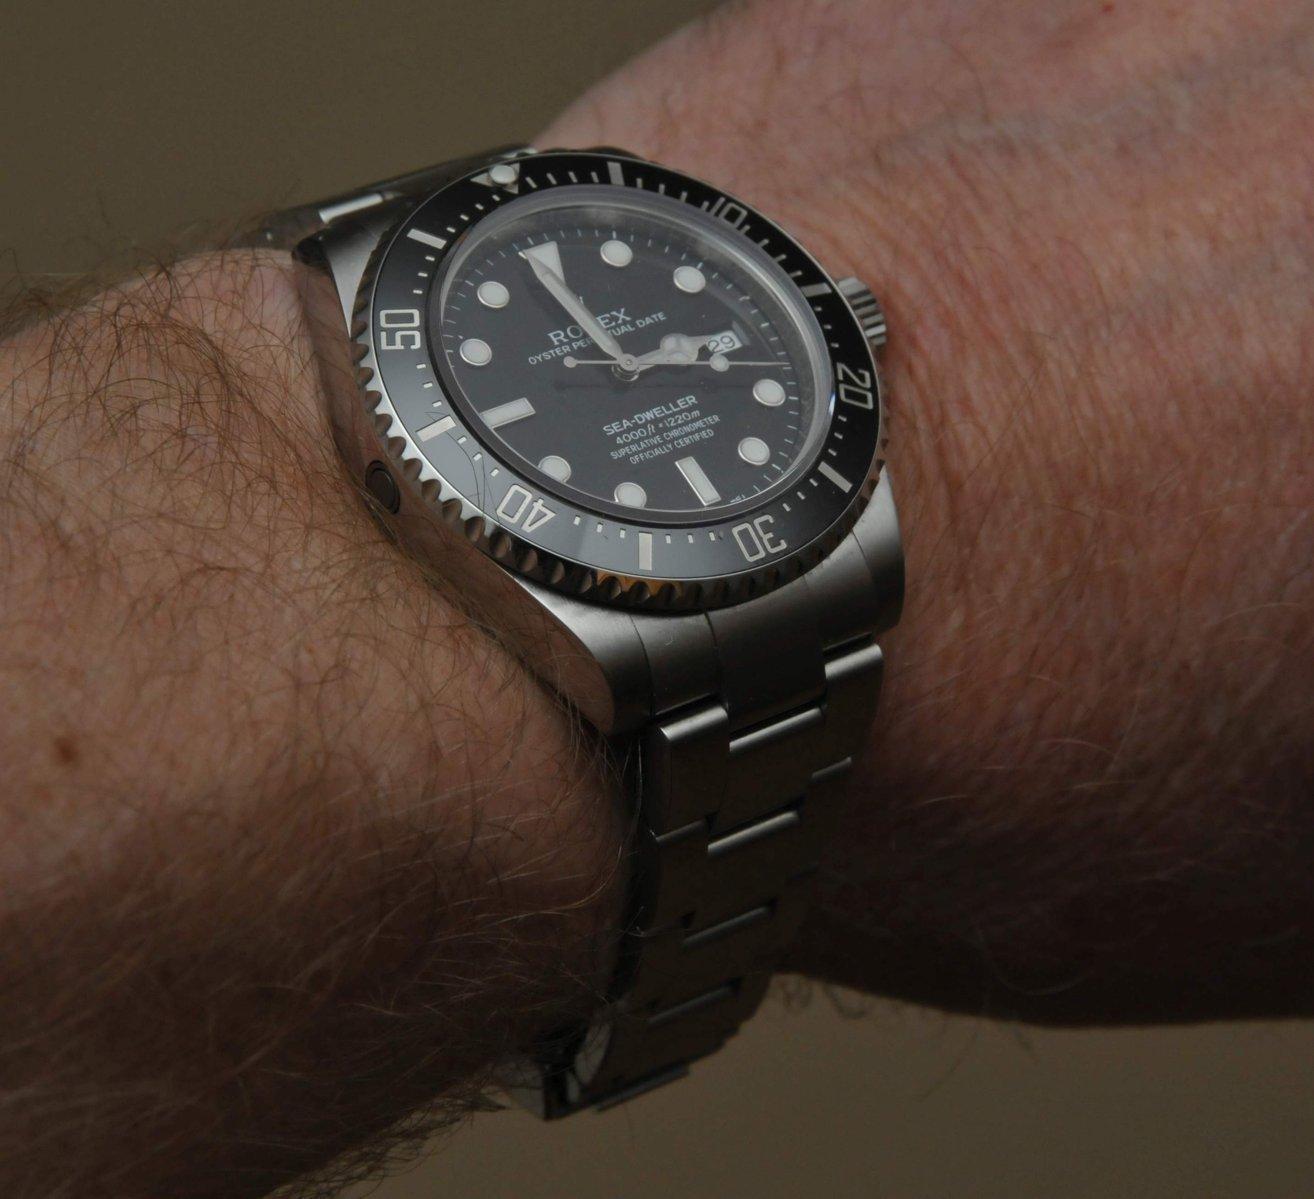 Rolex - halv.jpg